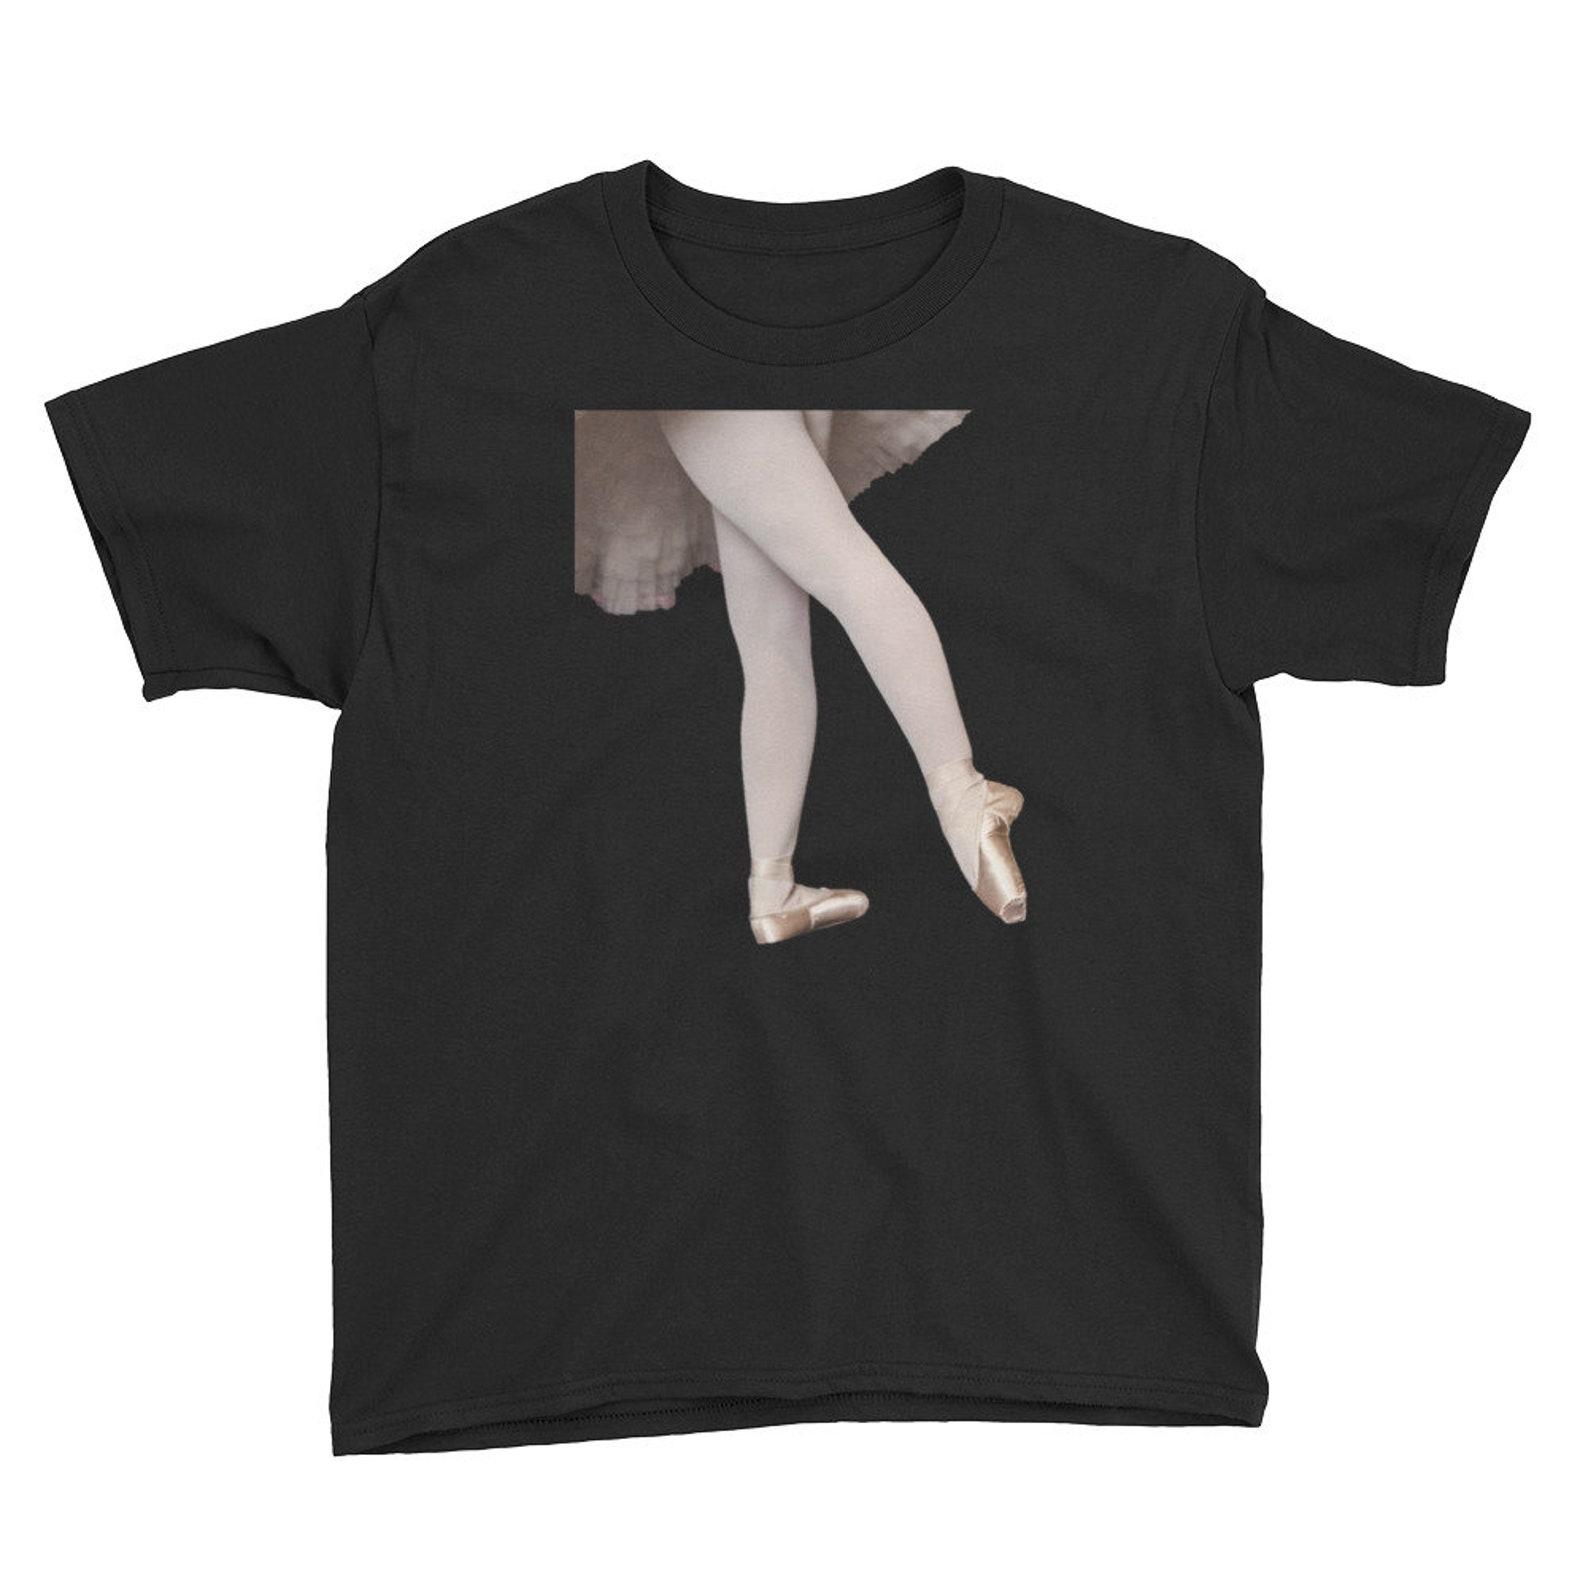 youth t-shirt/ballet feet screen printed shirt/children boutique/dancer/ballerina/sew on pointe